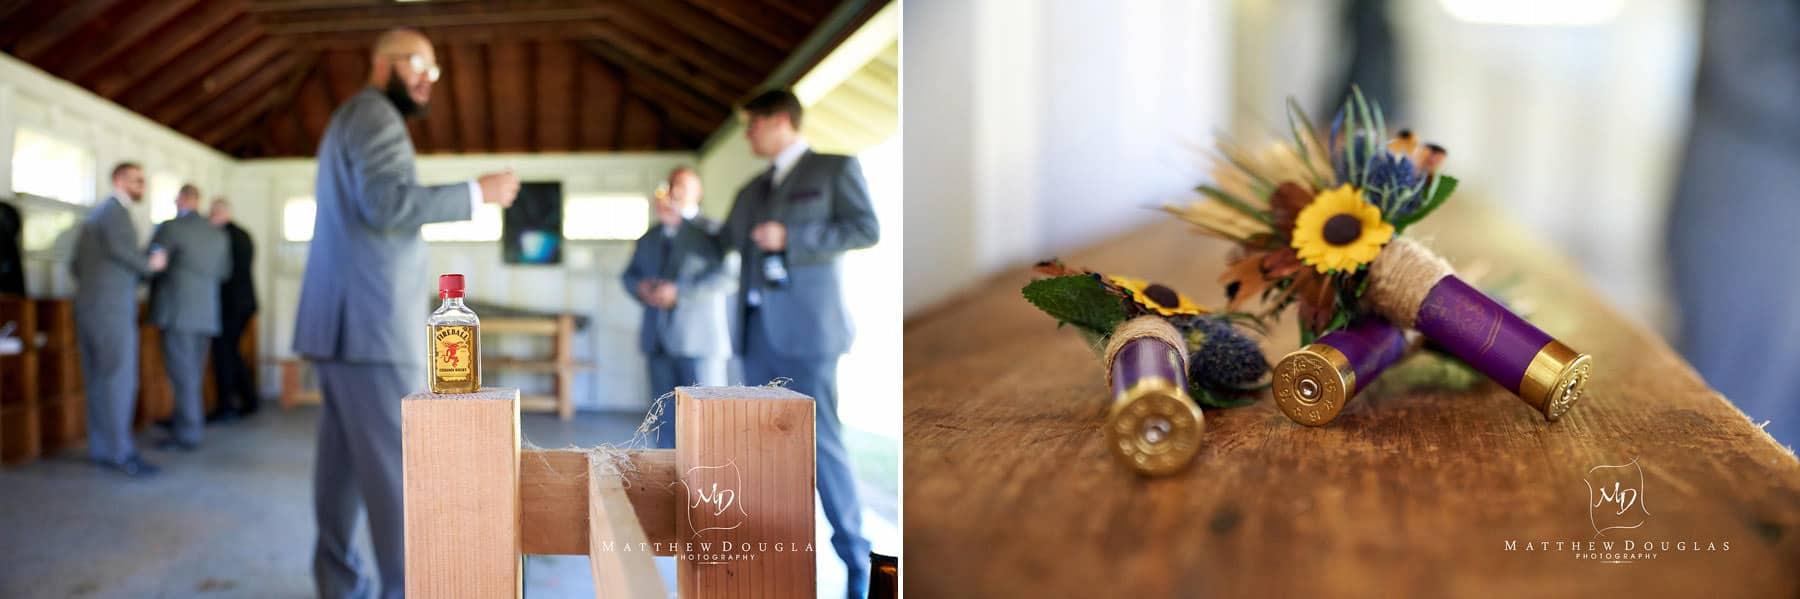 groom details wedding brady life camp